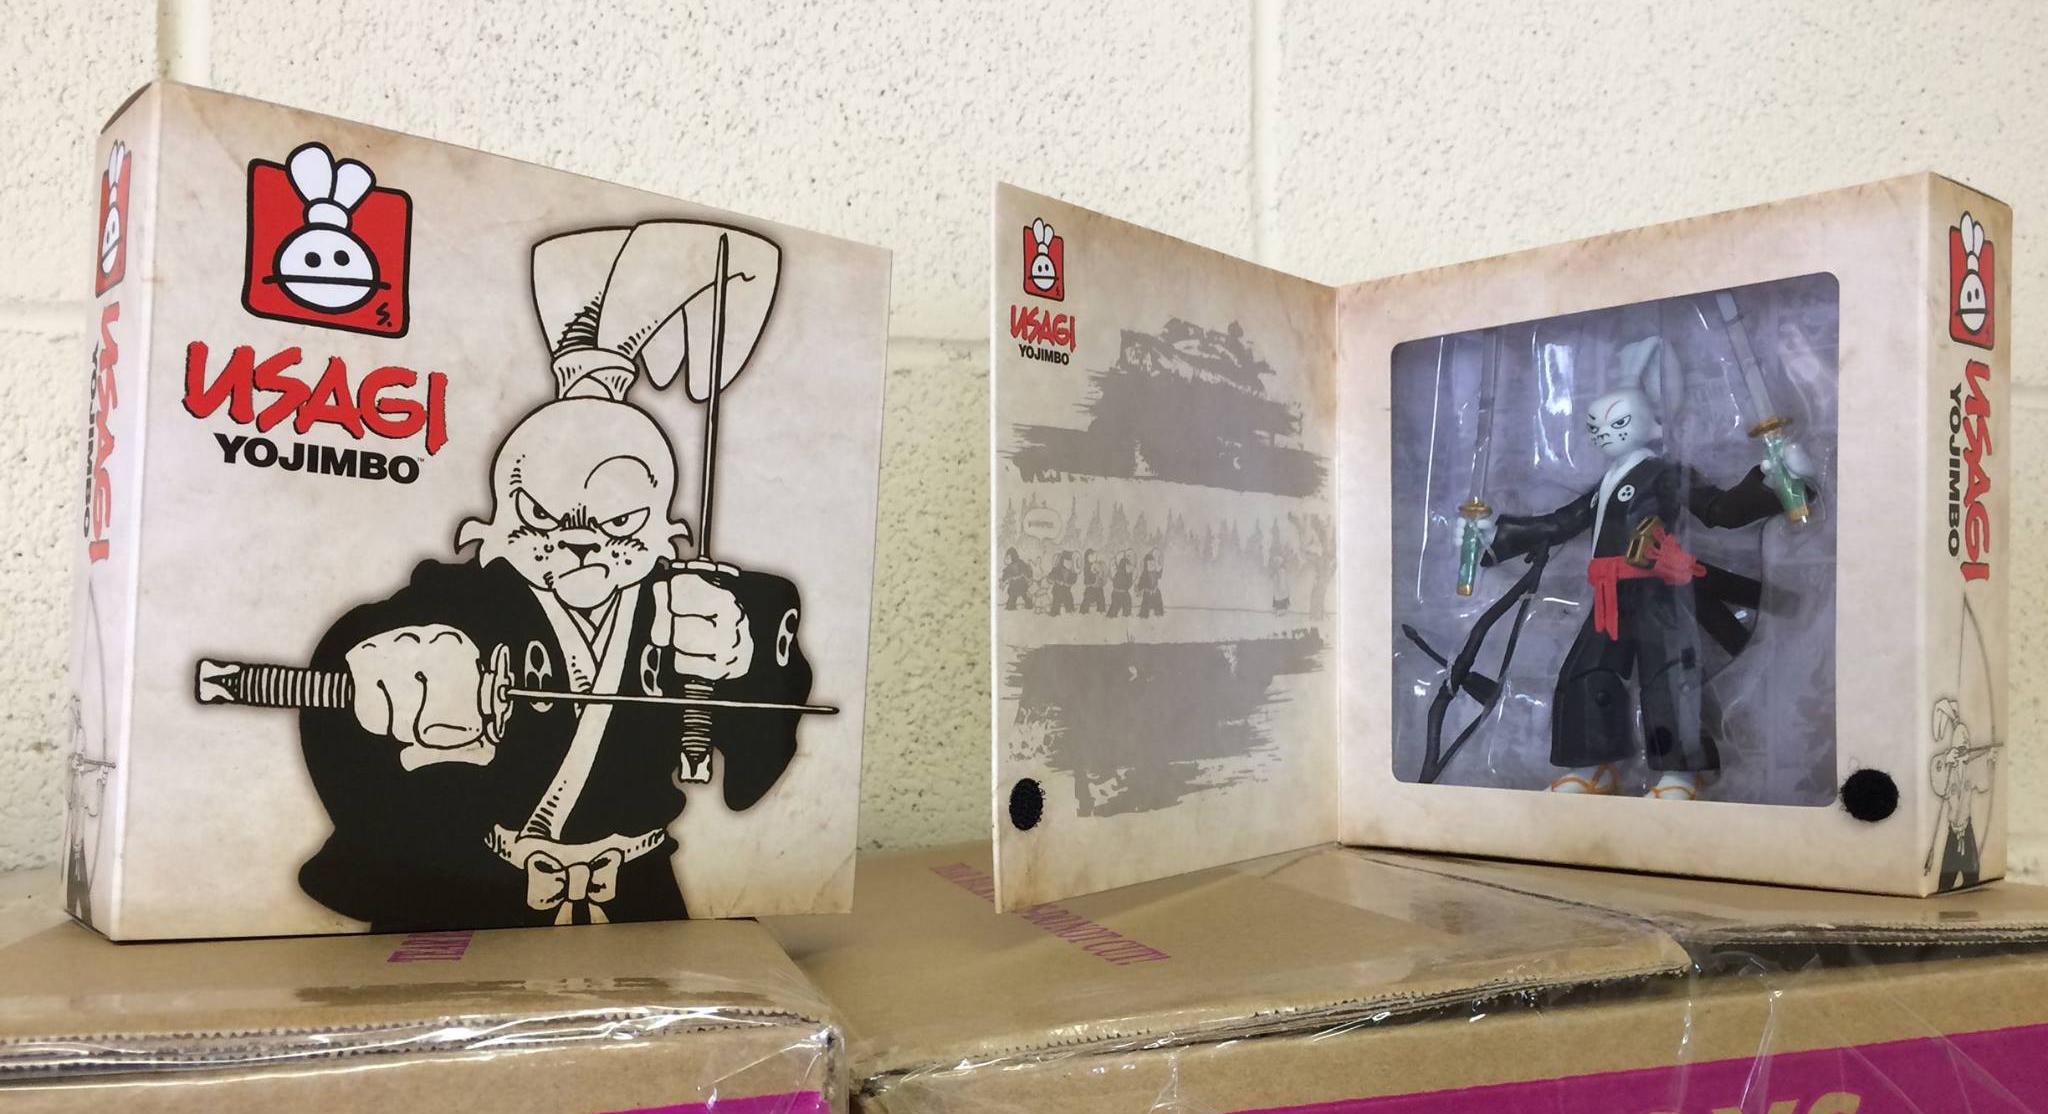 Playmates: Stan Sakai Usagi Yojimbo TMNT Variant